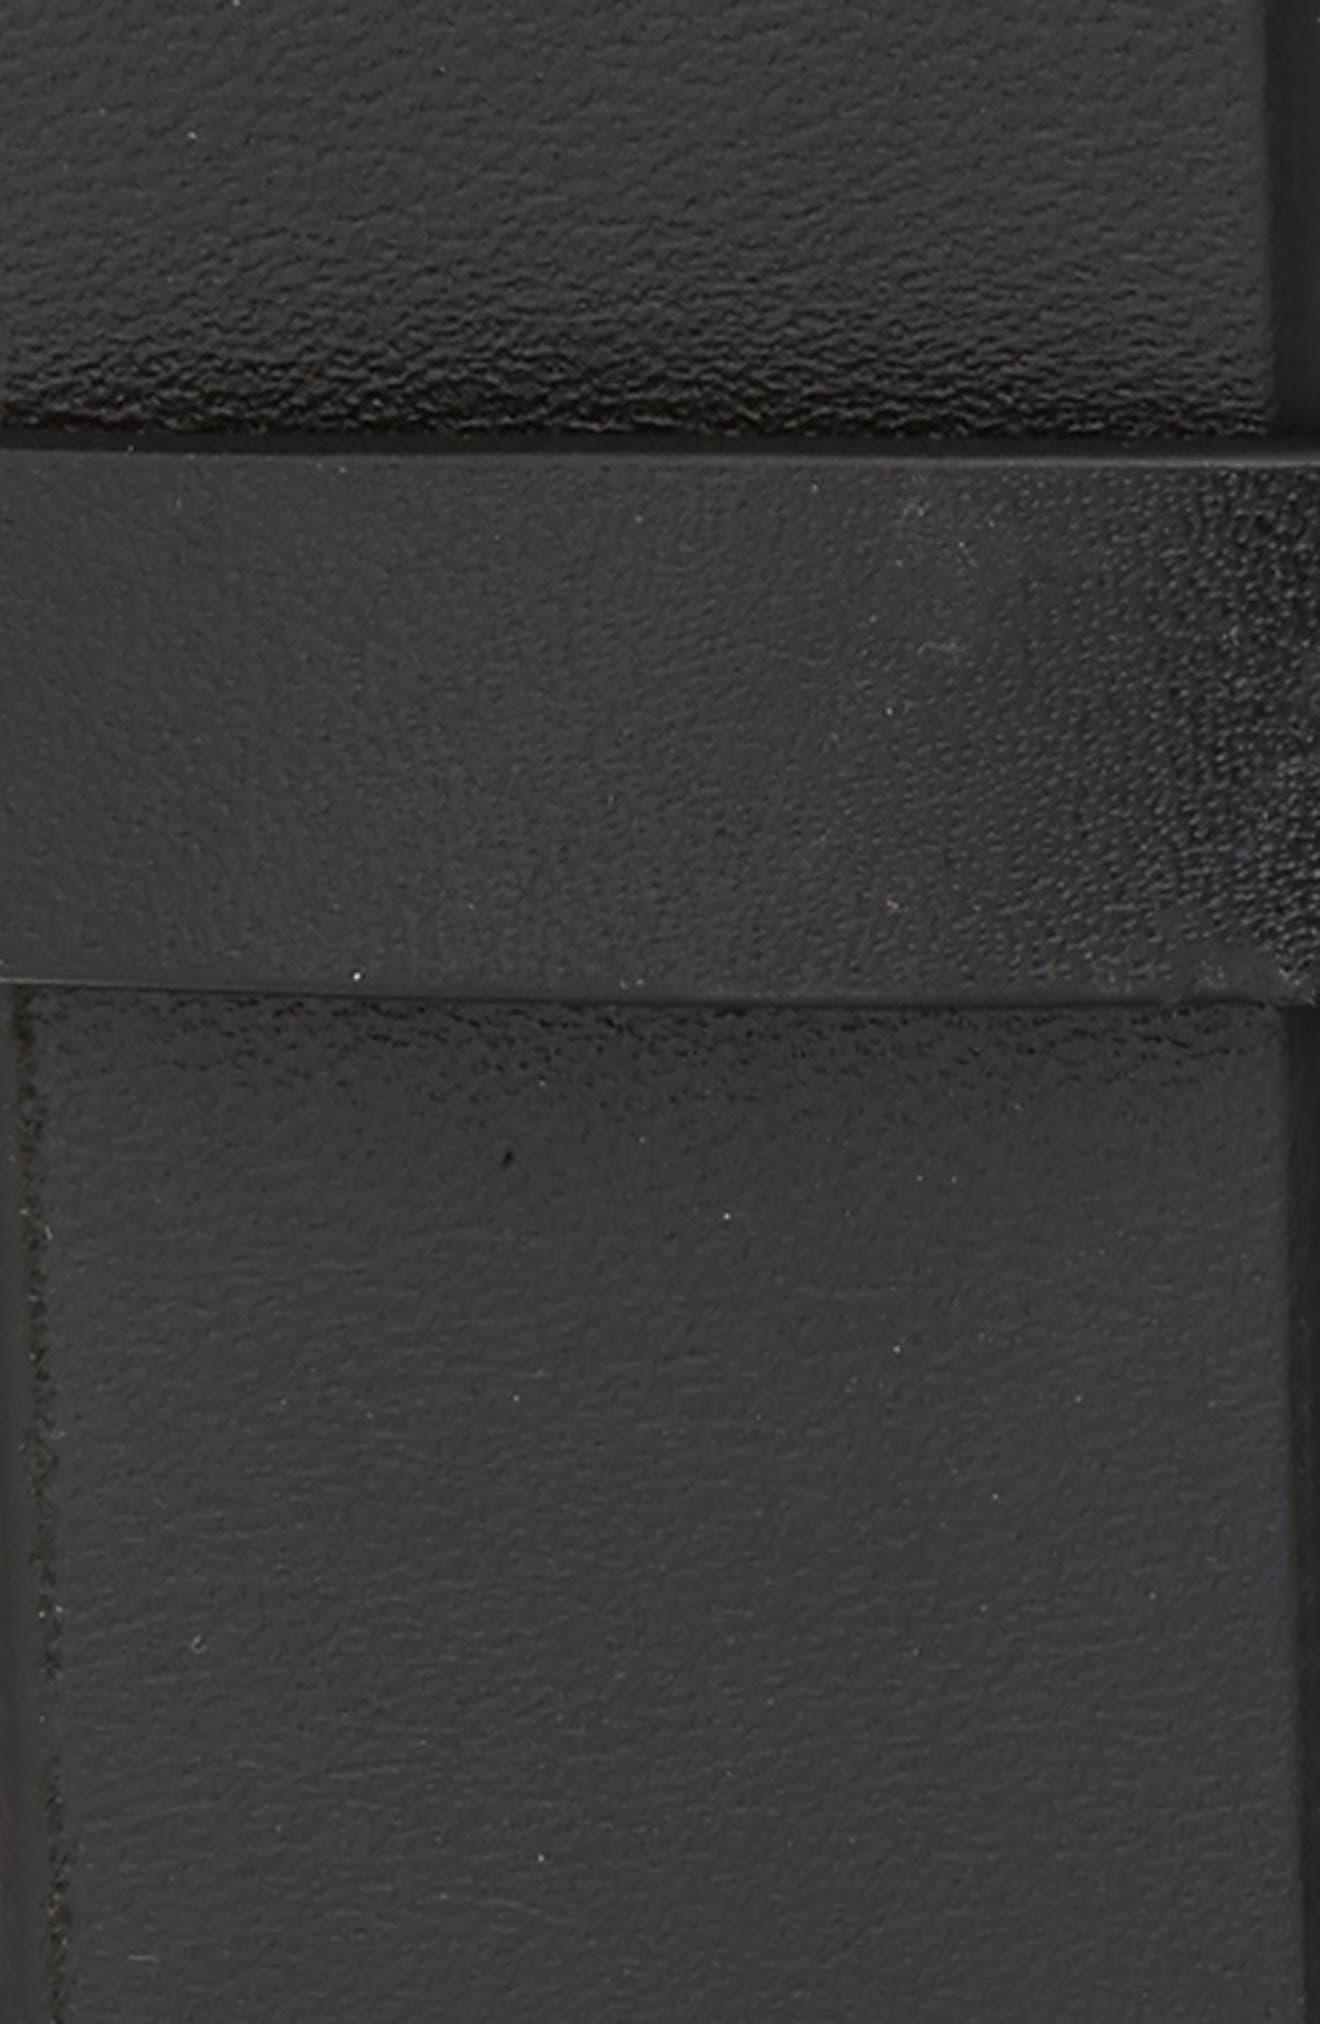 Mitered Leather Belt,                             Alternate thumbnail 2, color,                             BLACK/ IVORY